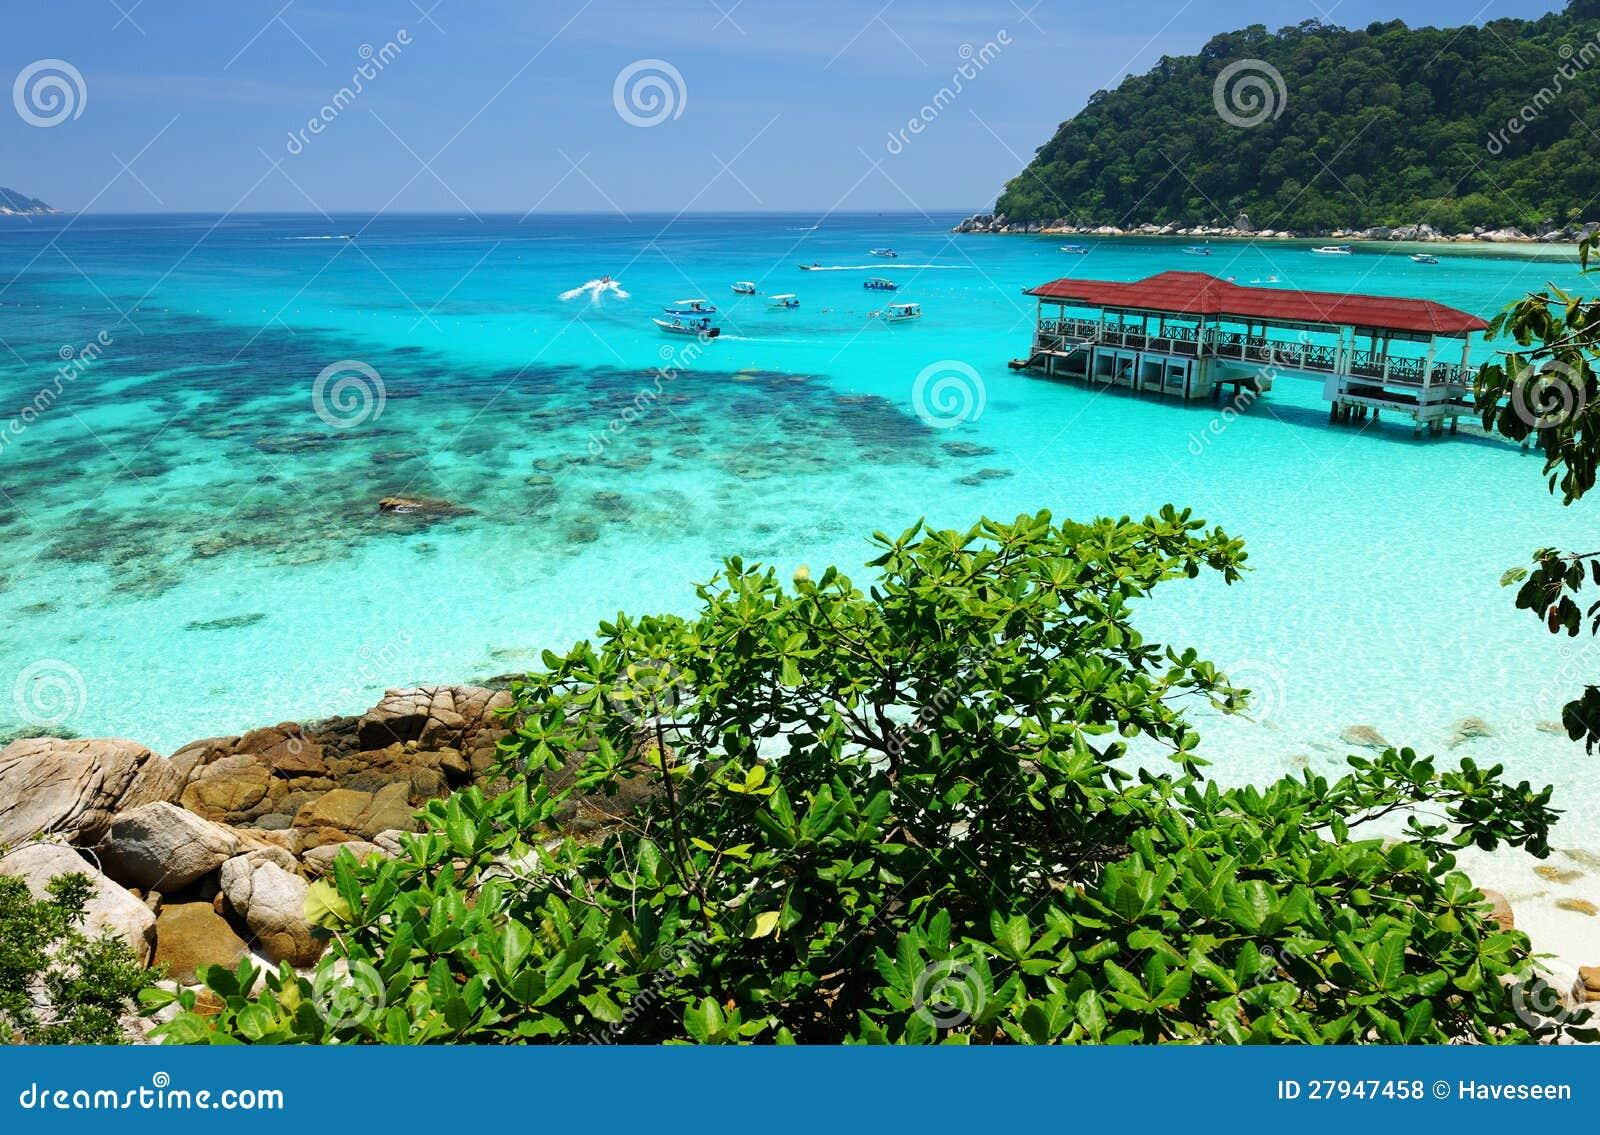 Beautiful Beach Royalty Free Stock Photos Image 27947458